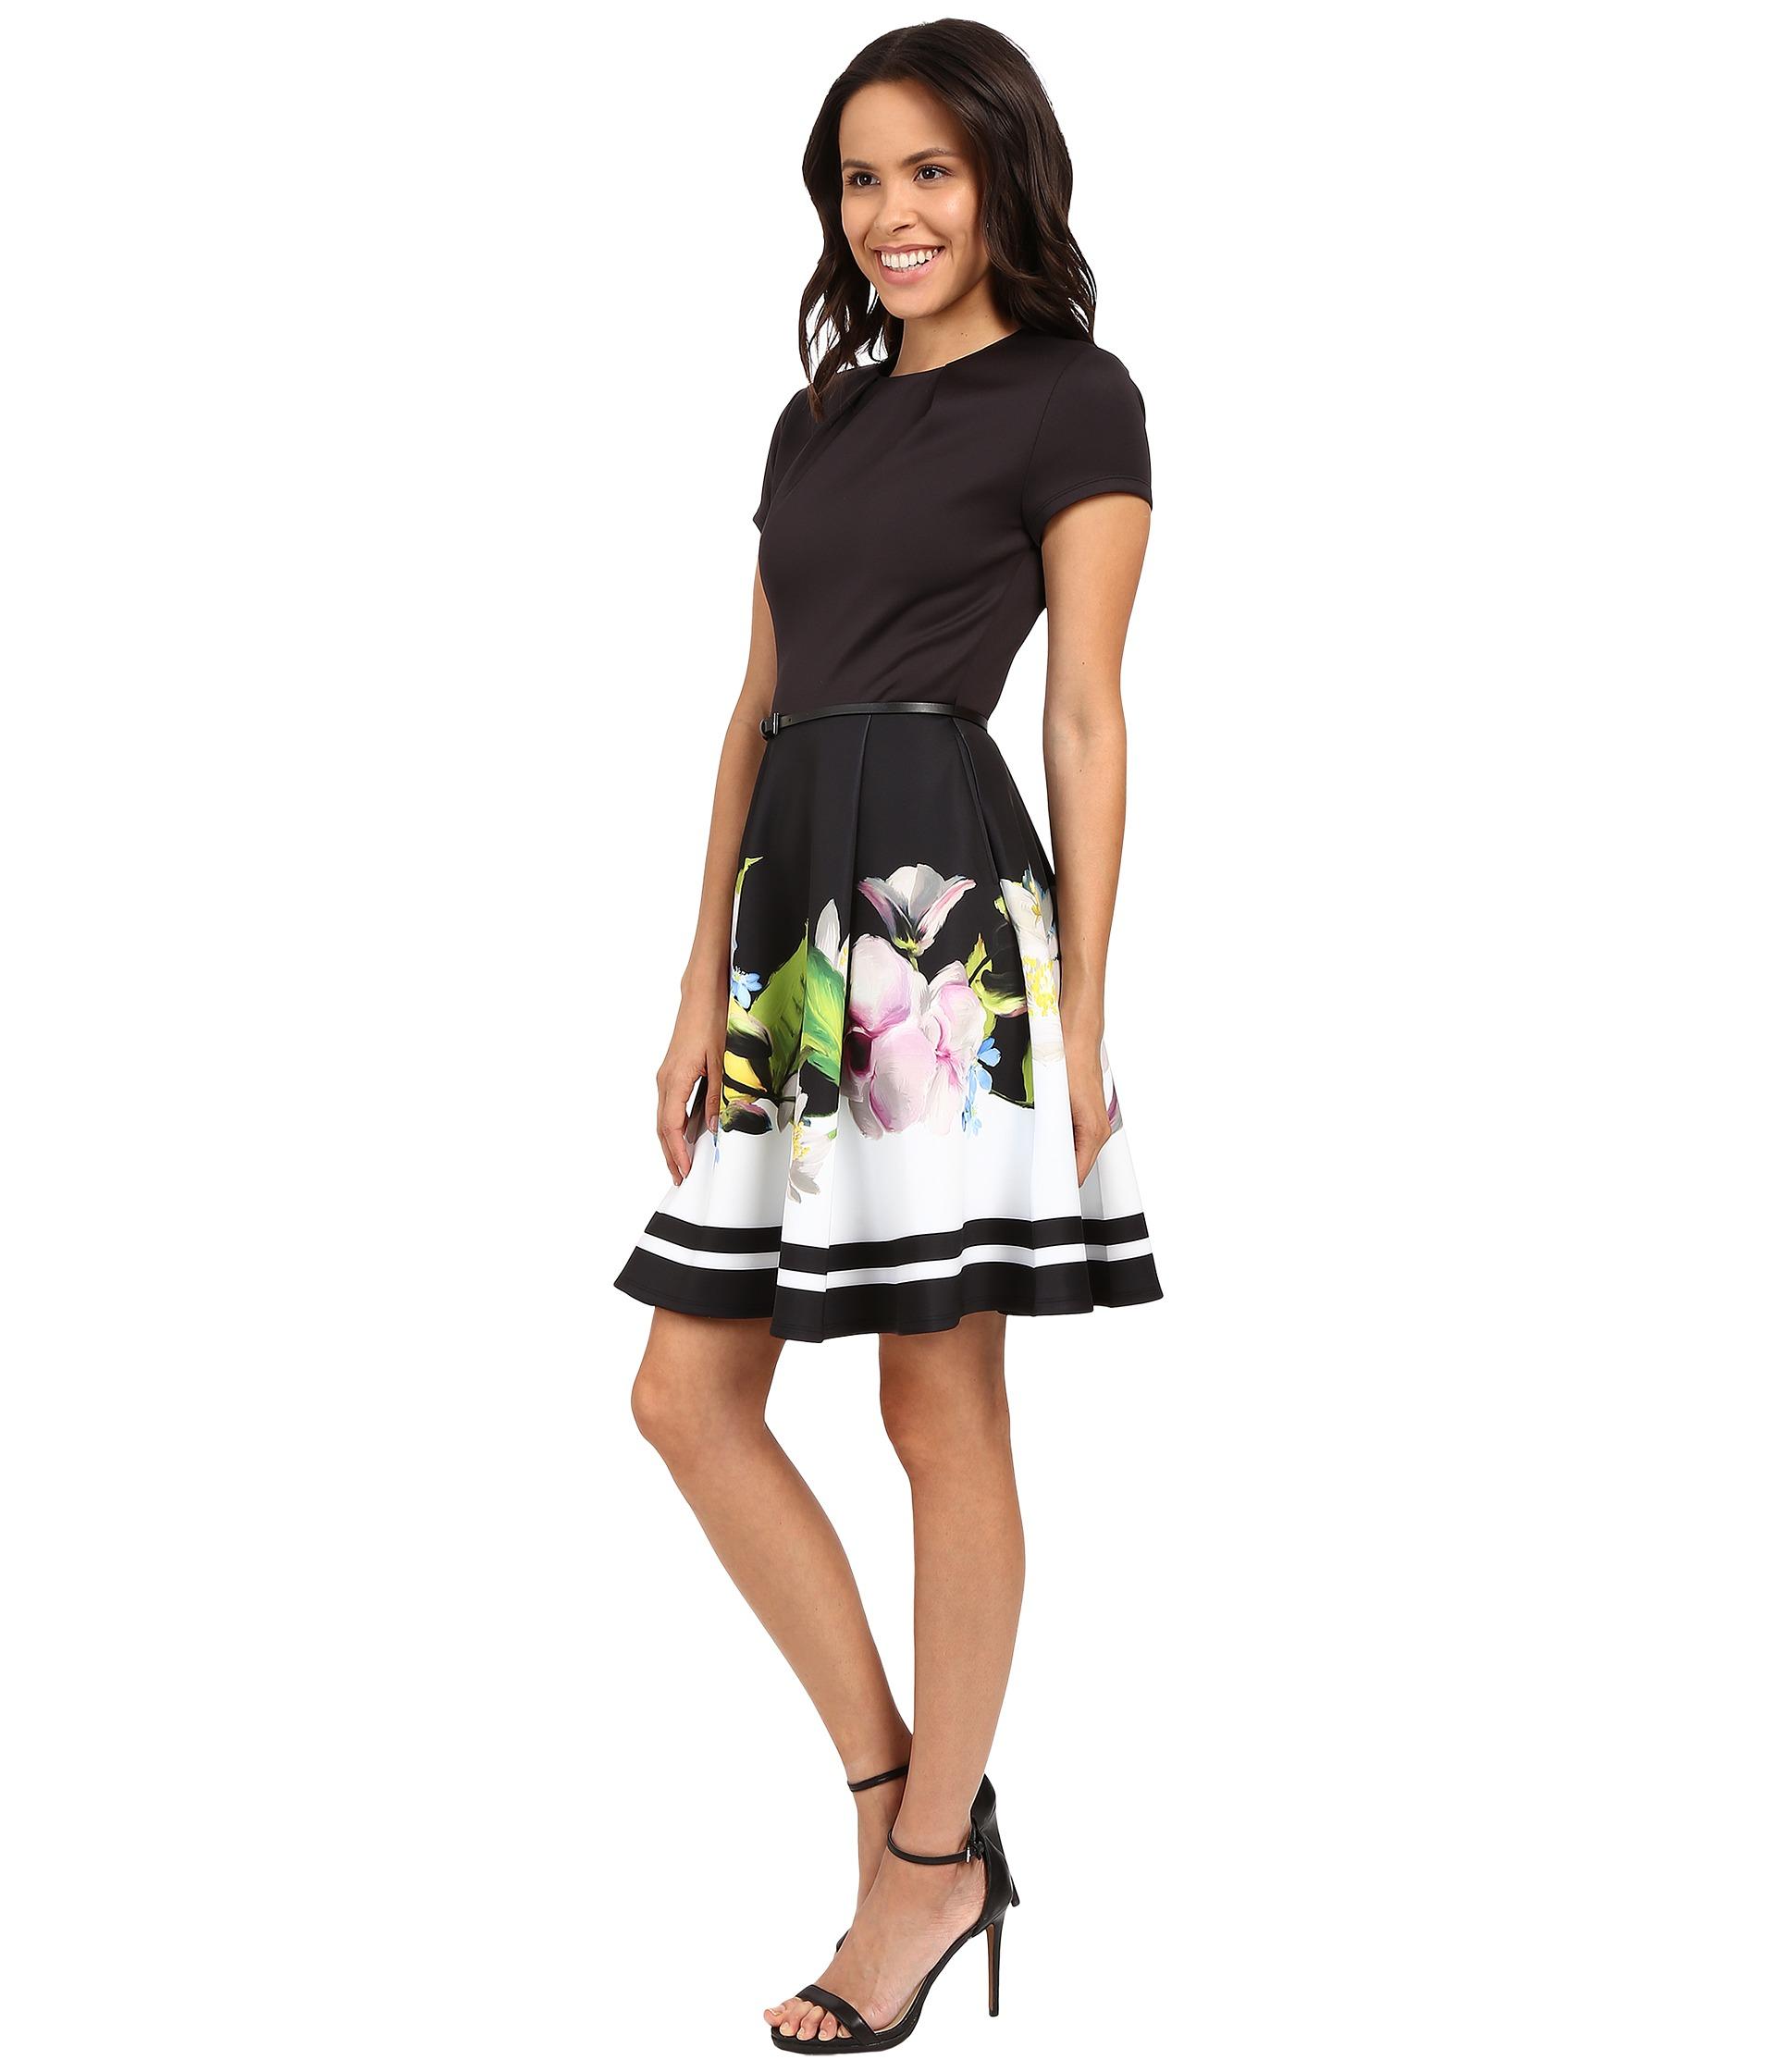 c8ec6040d43fd Lyst - Ted Baker Vidaa Bow Detail Neoprene Dress in Black